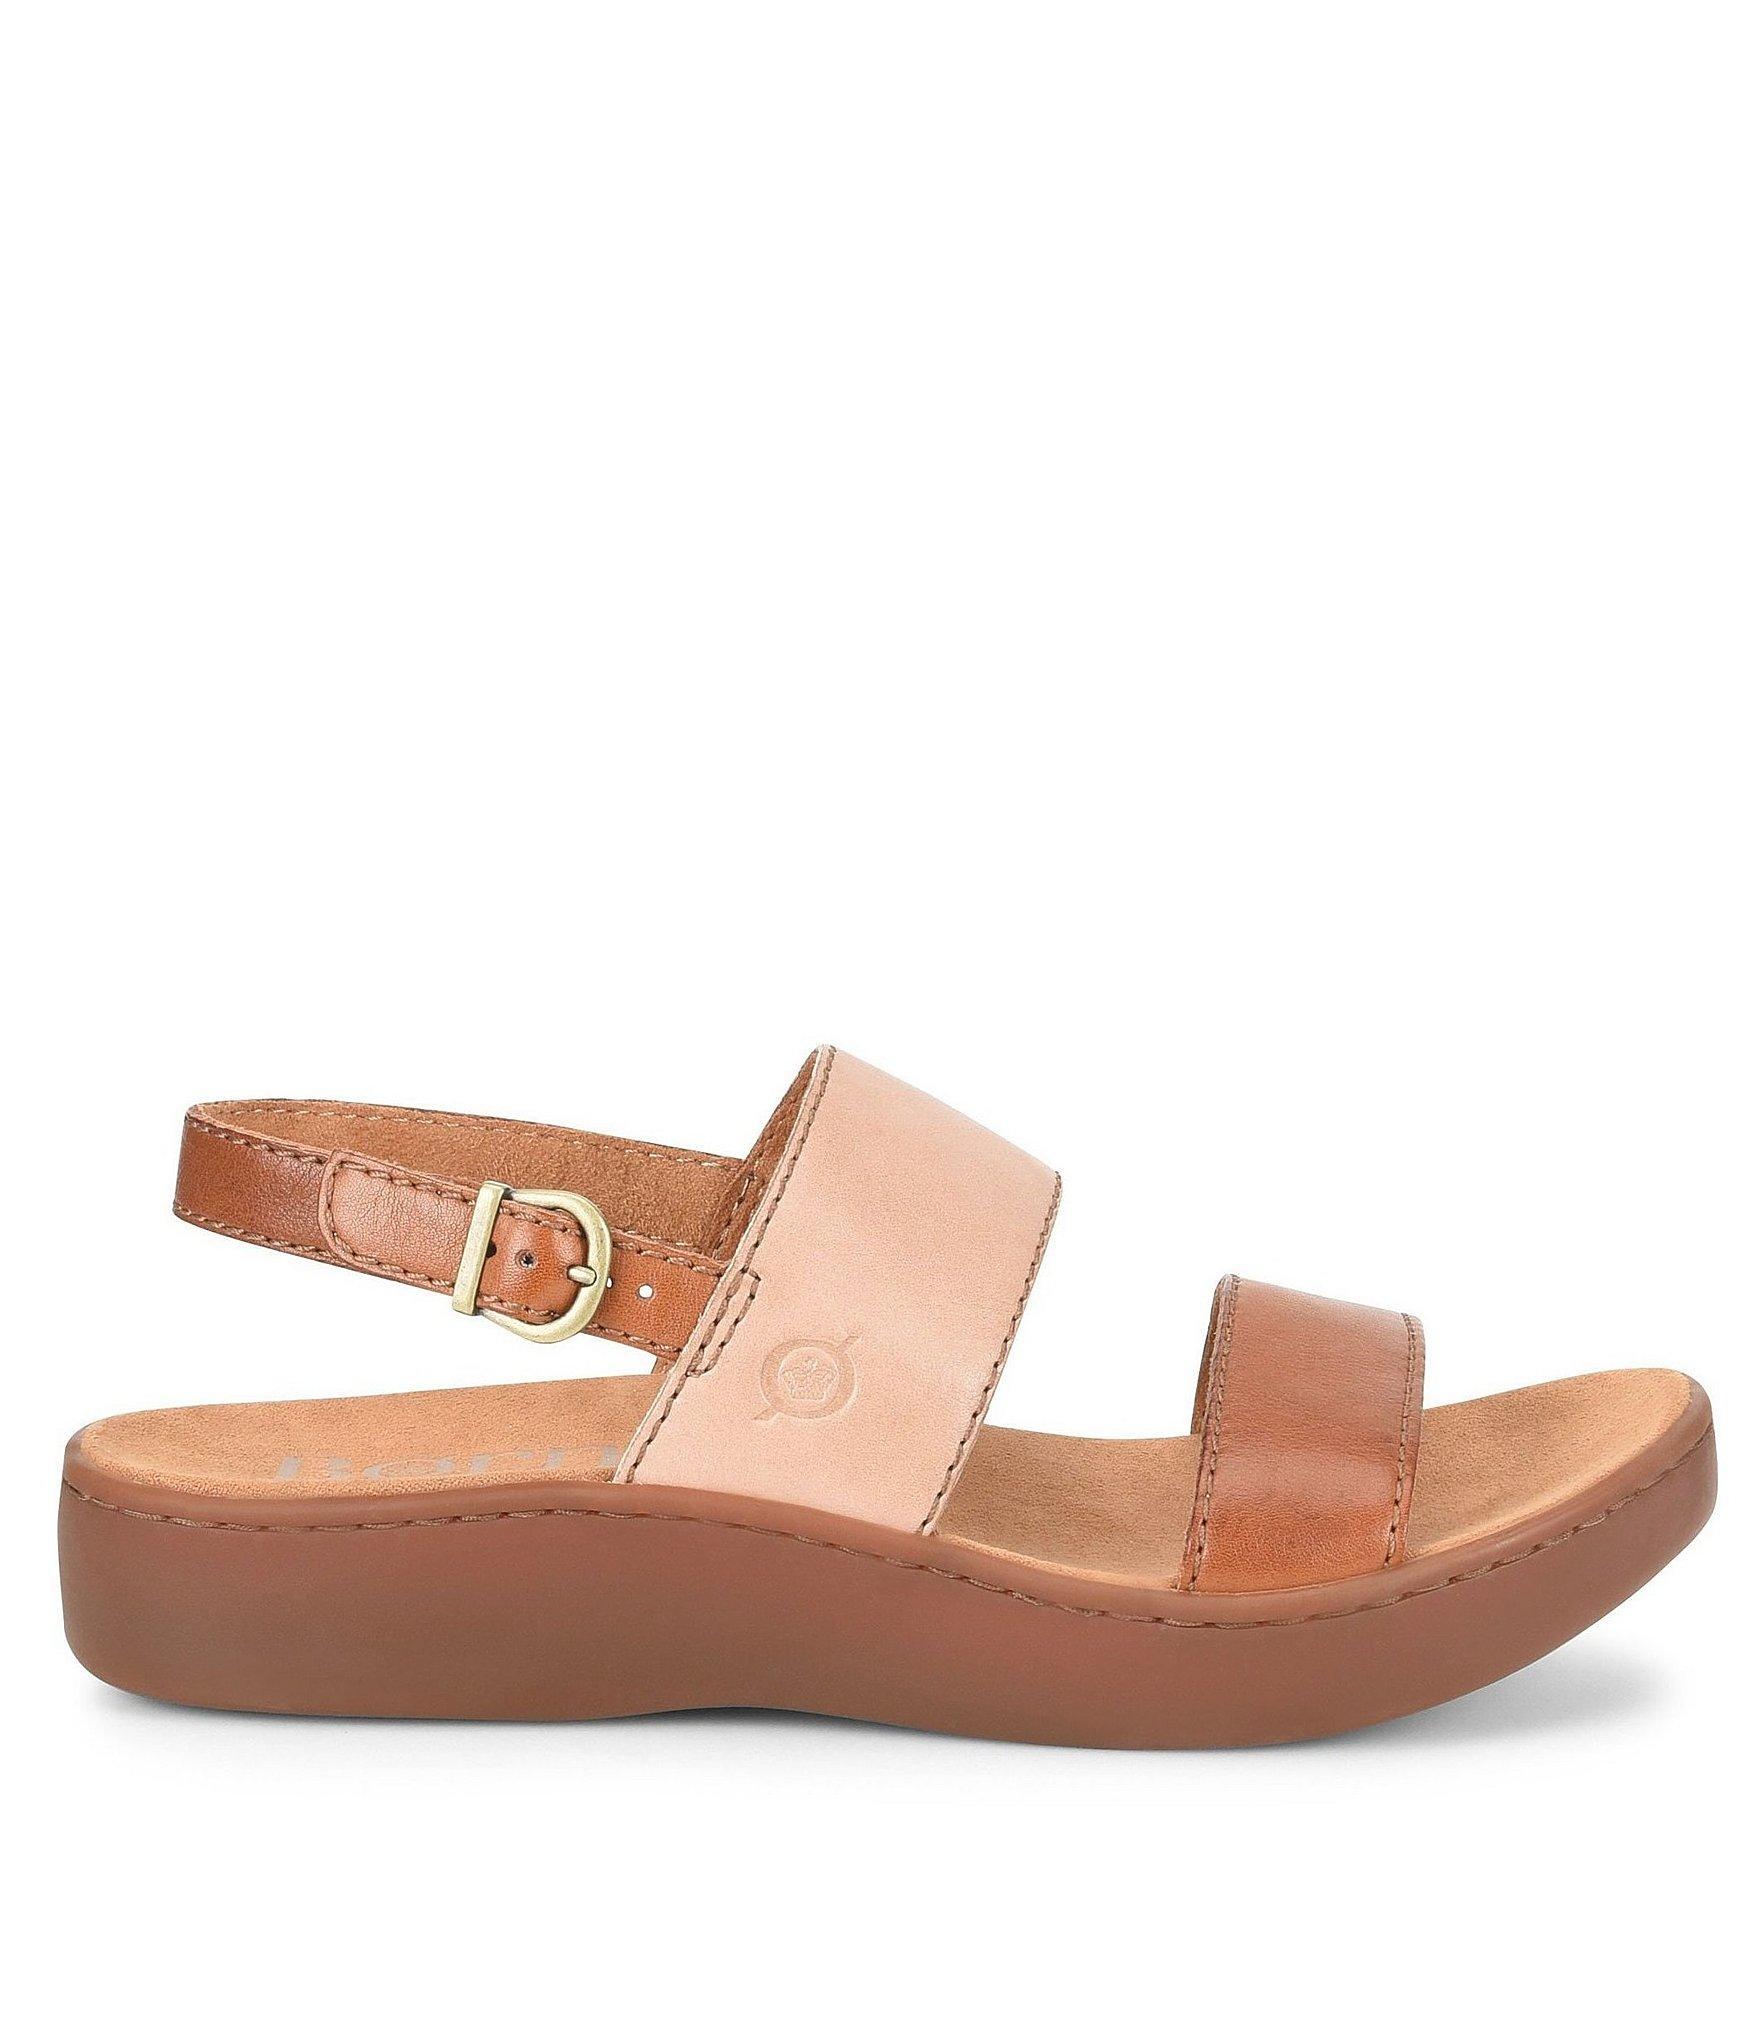 46aa2ba367e7 Born - Brown Oconee Banded Leather Sandals - Lyst. View fullscreen